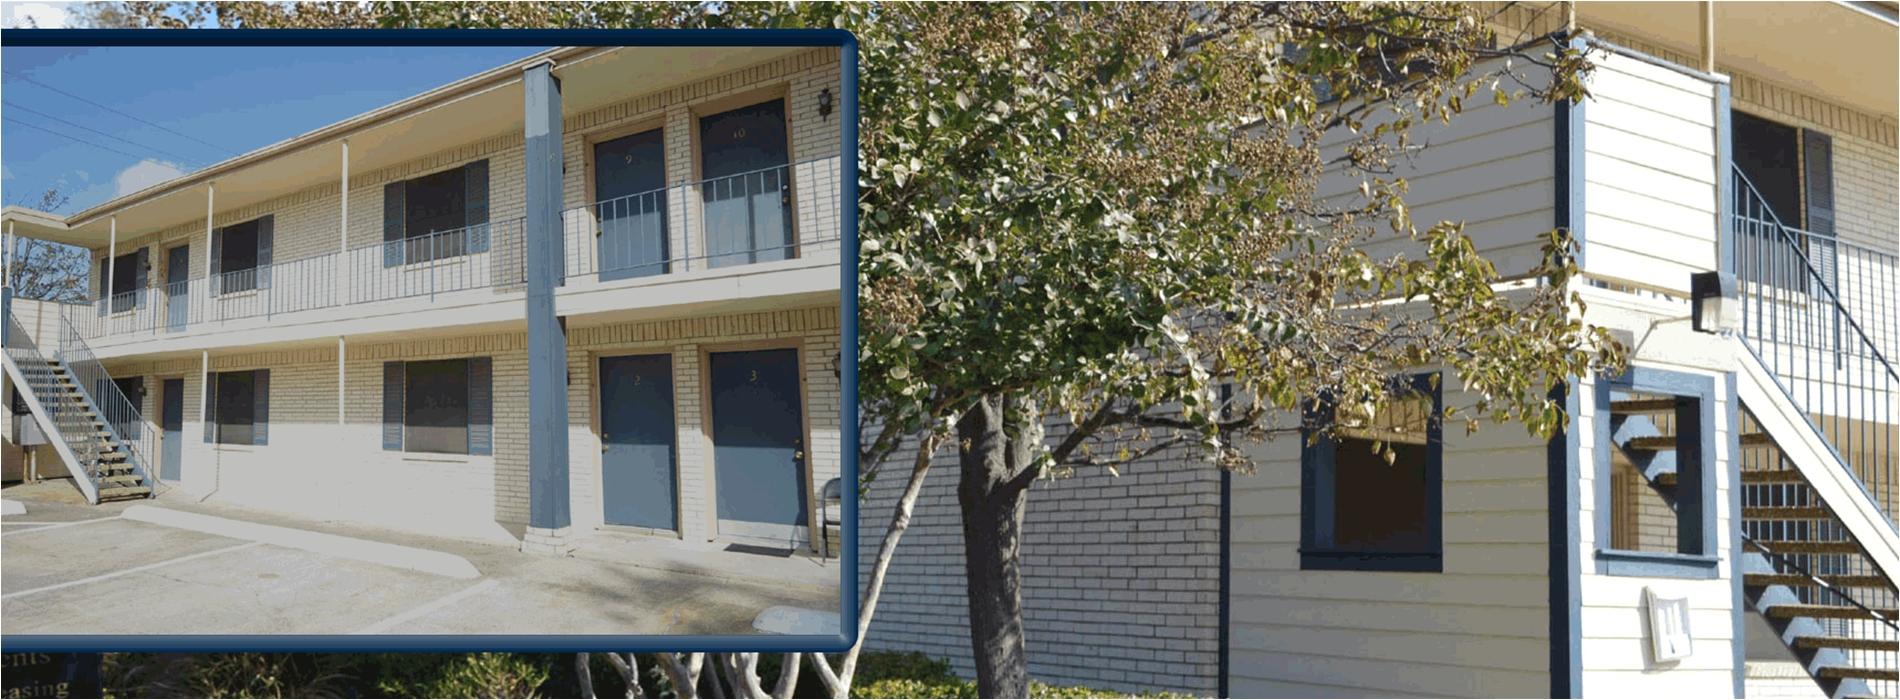 welcome to hampton village apartments in desoto texas